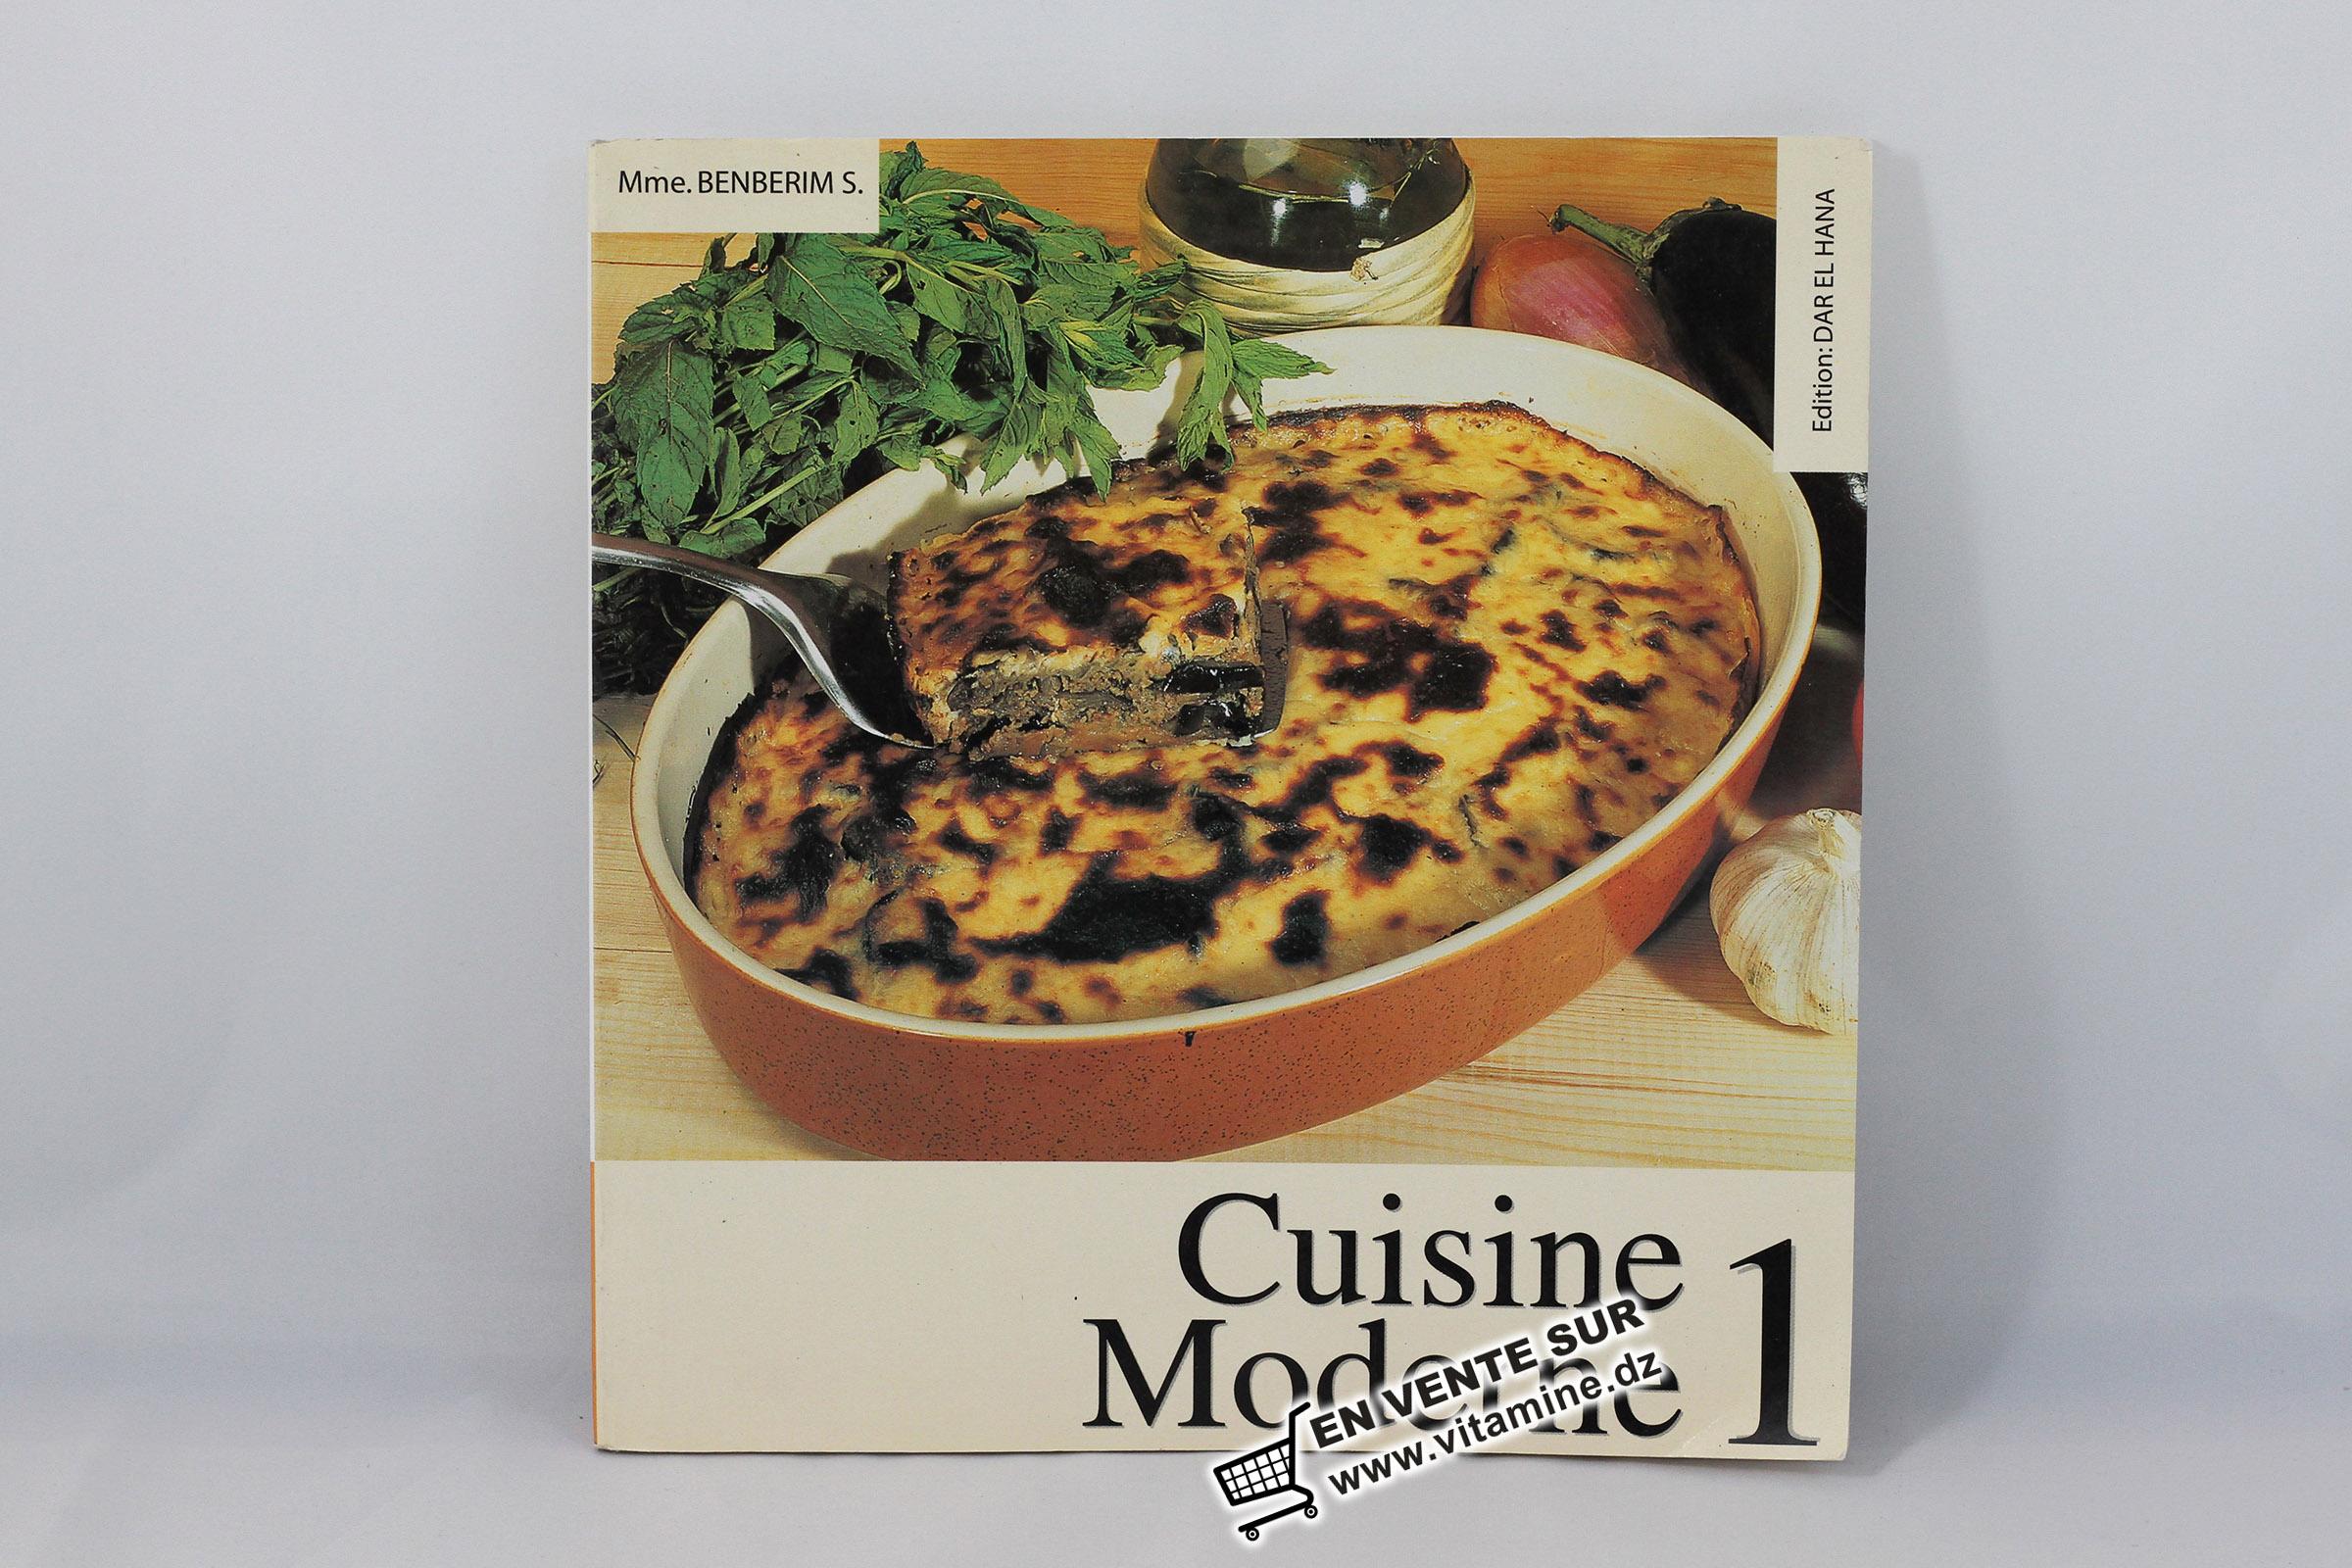 BENBERIM Saida - Cuisine Moderne 1